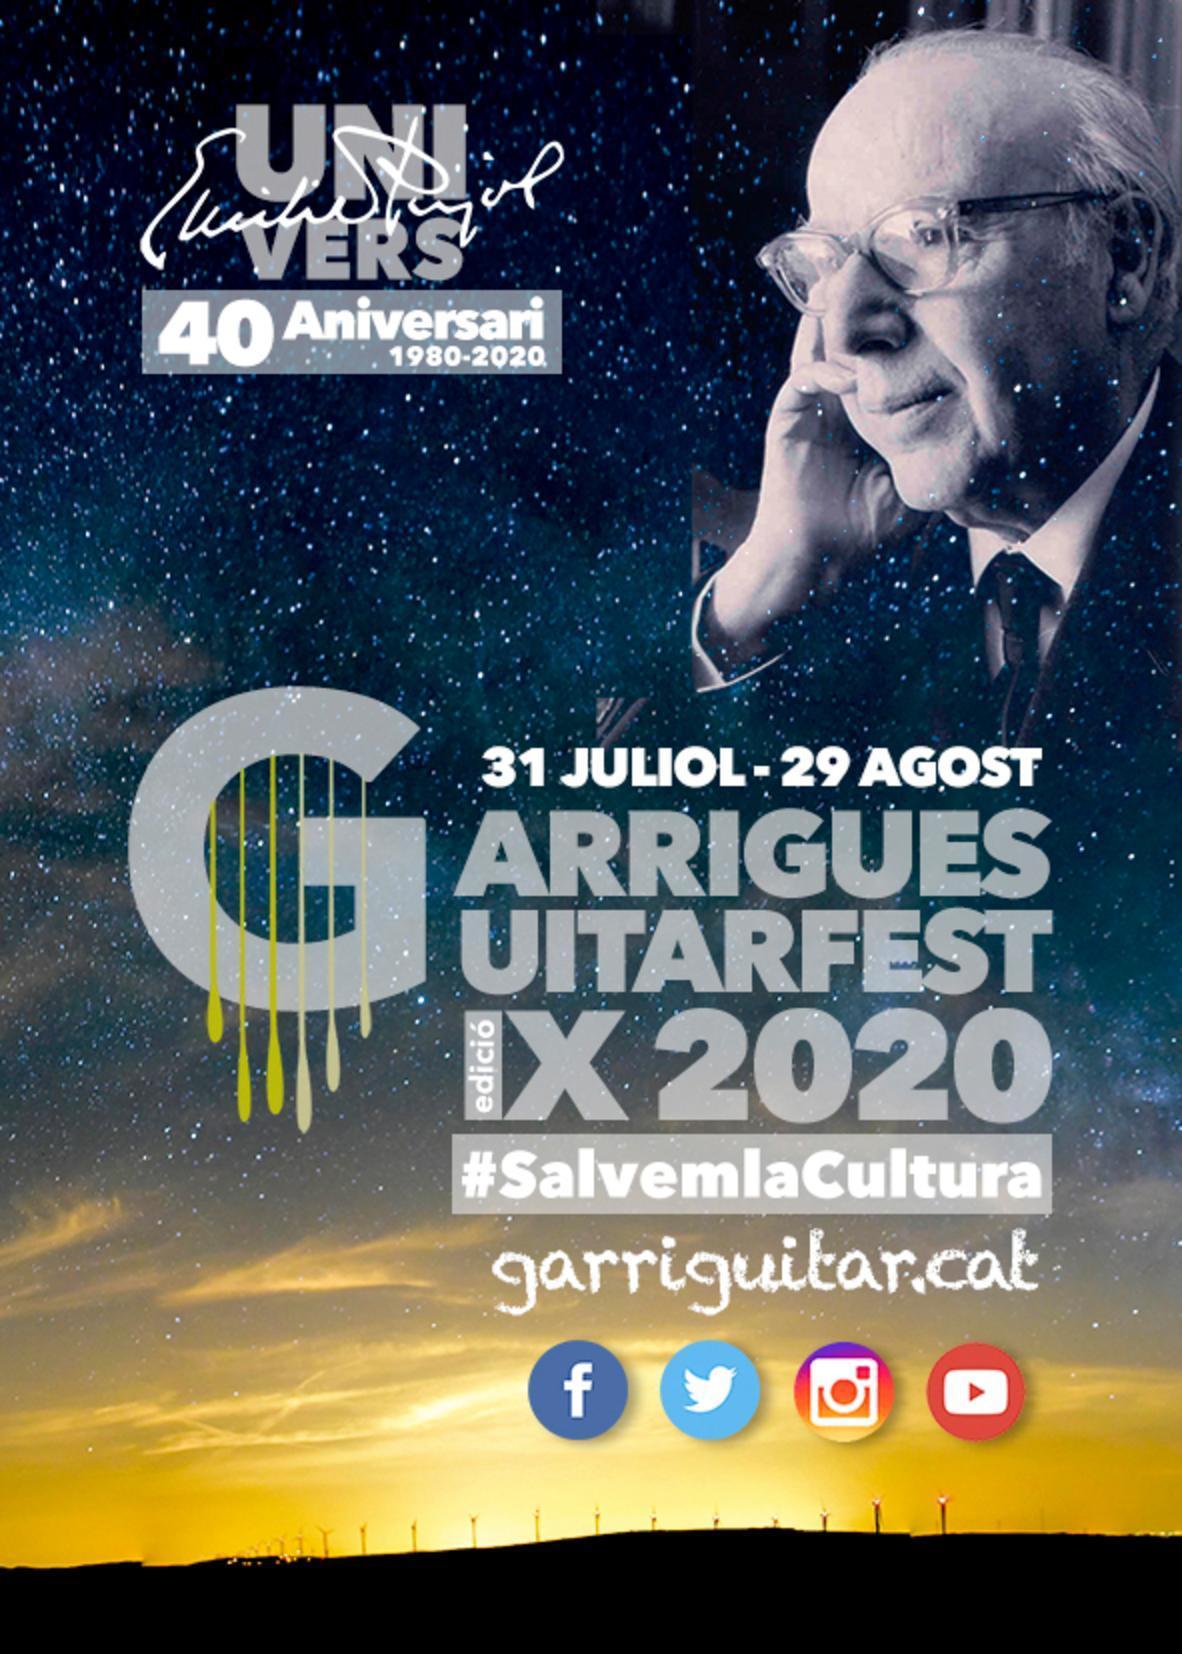 A Piacere Trio - Garrigues Guitar Festival